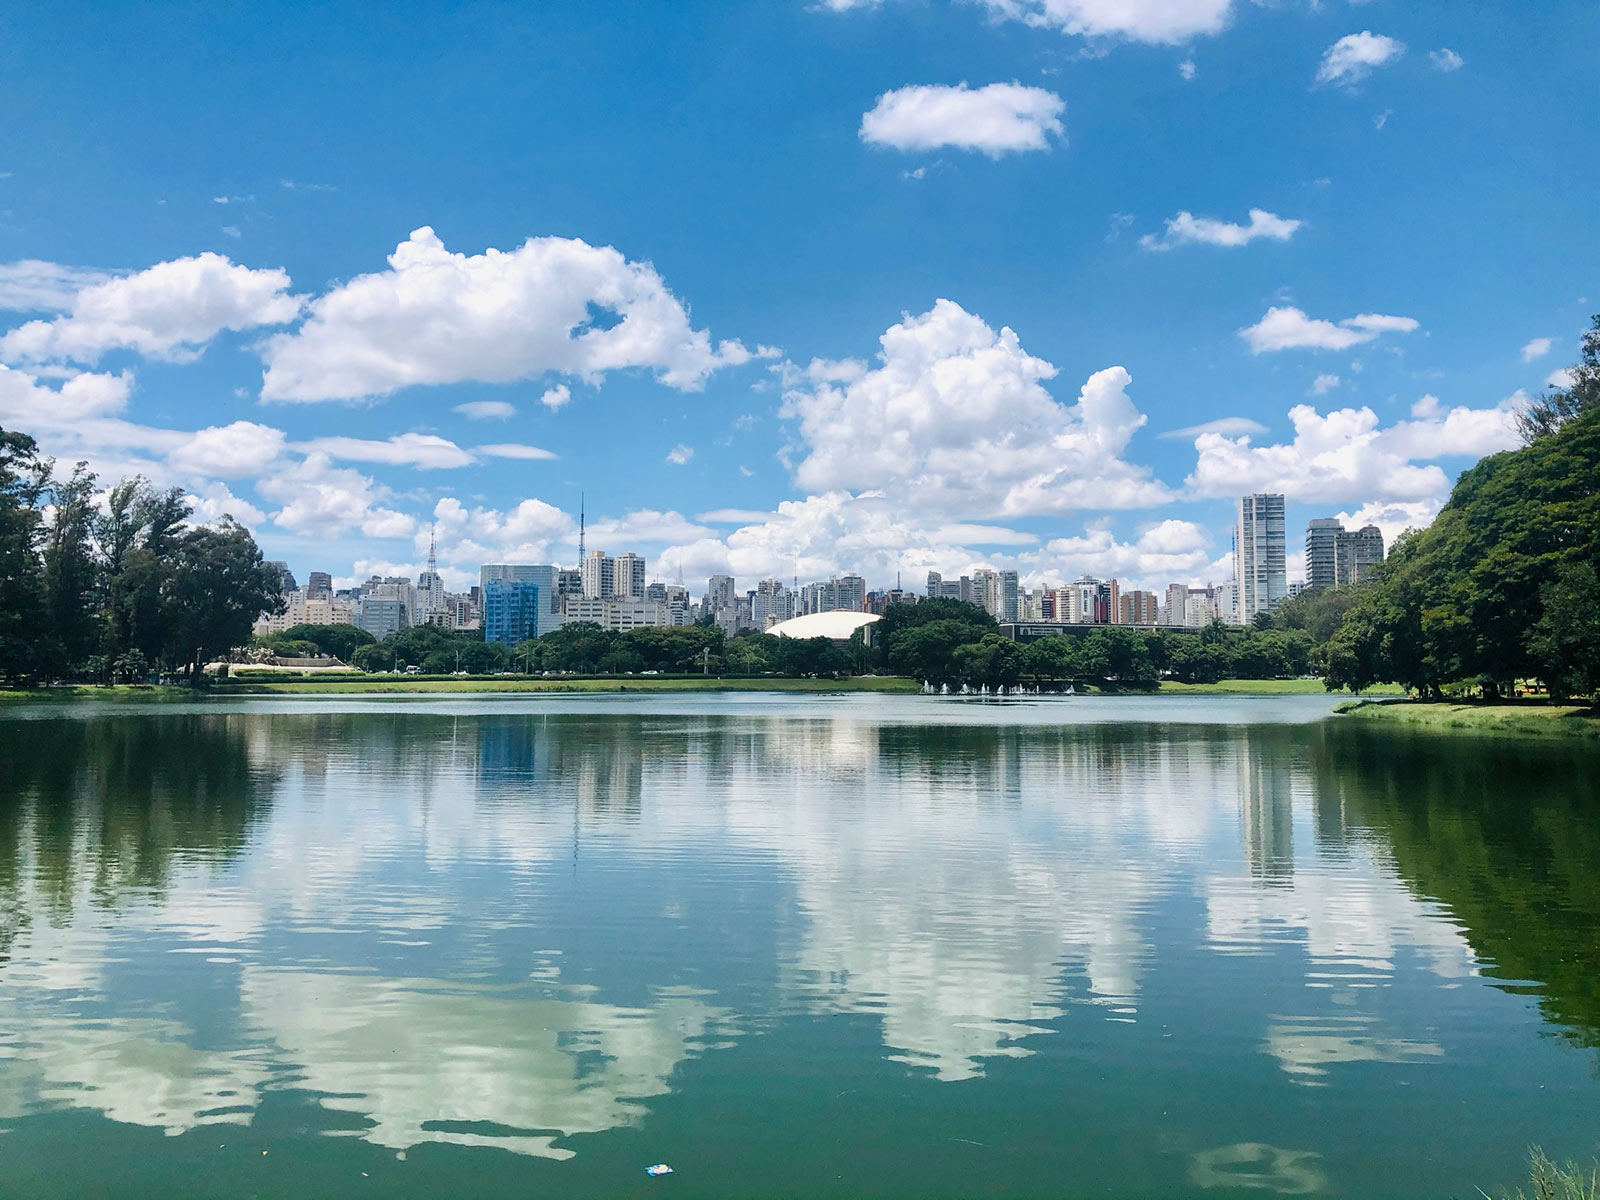 São Paulo – Dél-Amerika Berlinje több, mint szürke betondzsungel